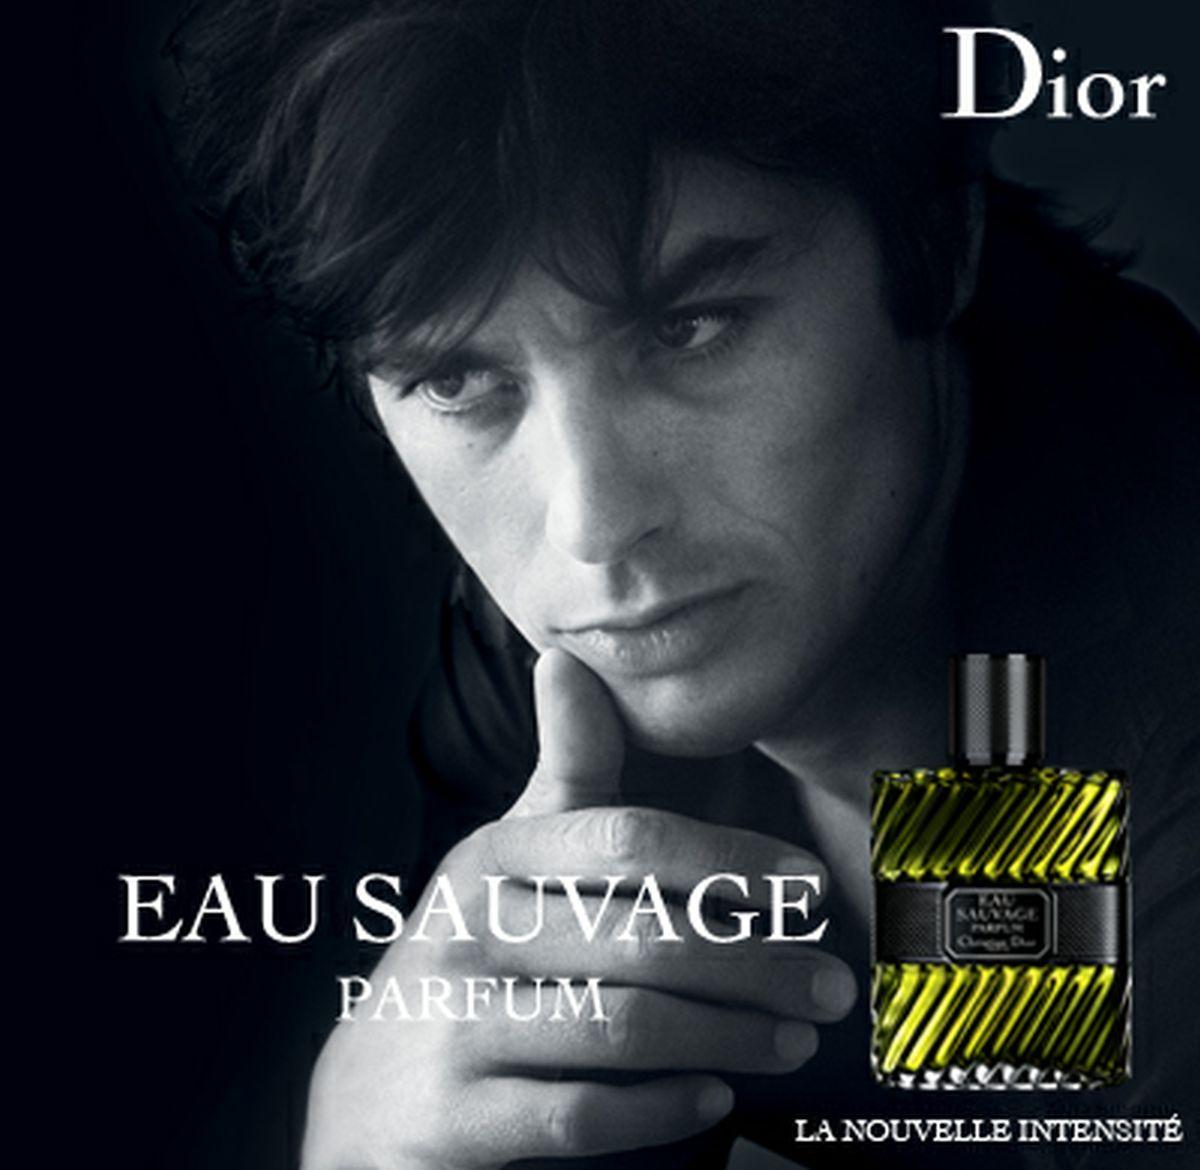 Dior-Eau_Sauvage-Eau_Sauvage_Parfum_Alain_Delon